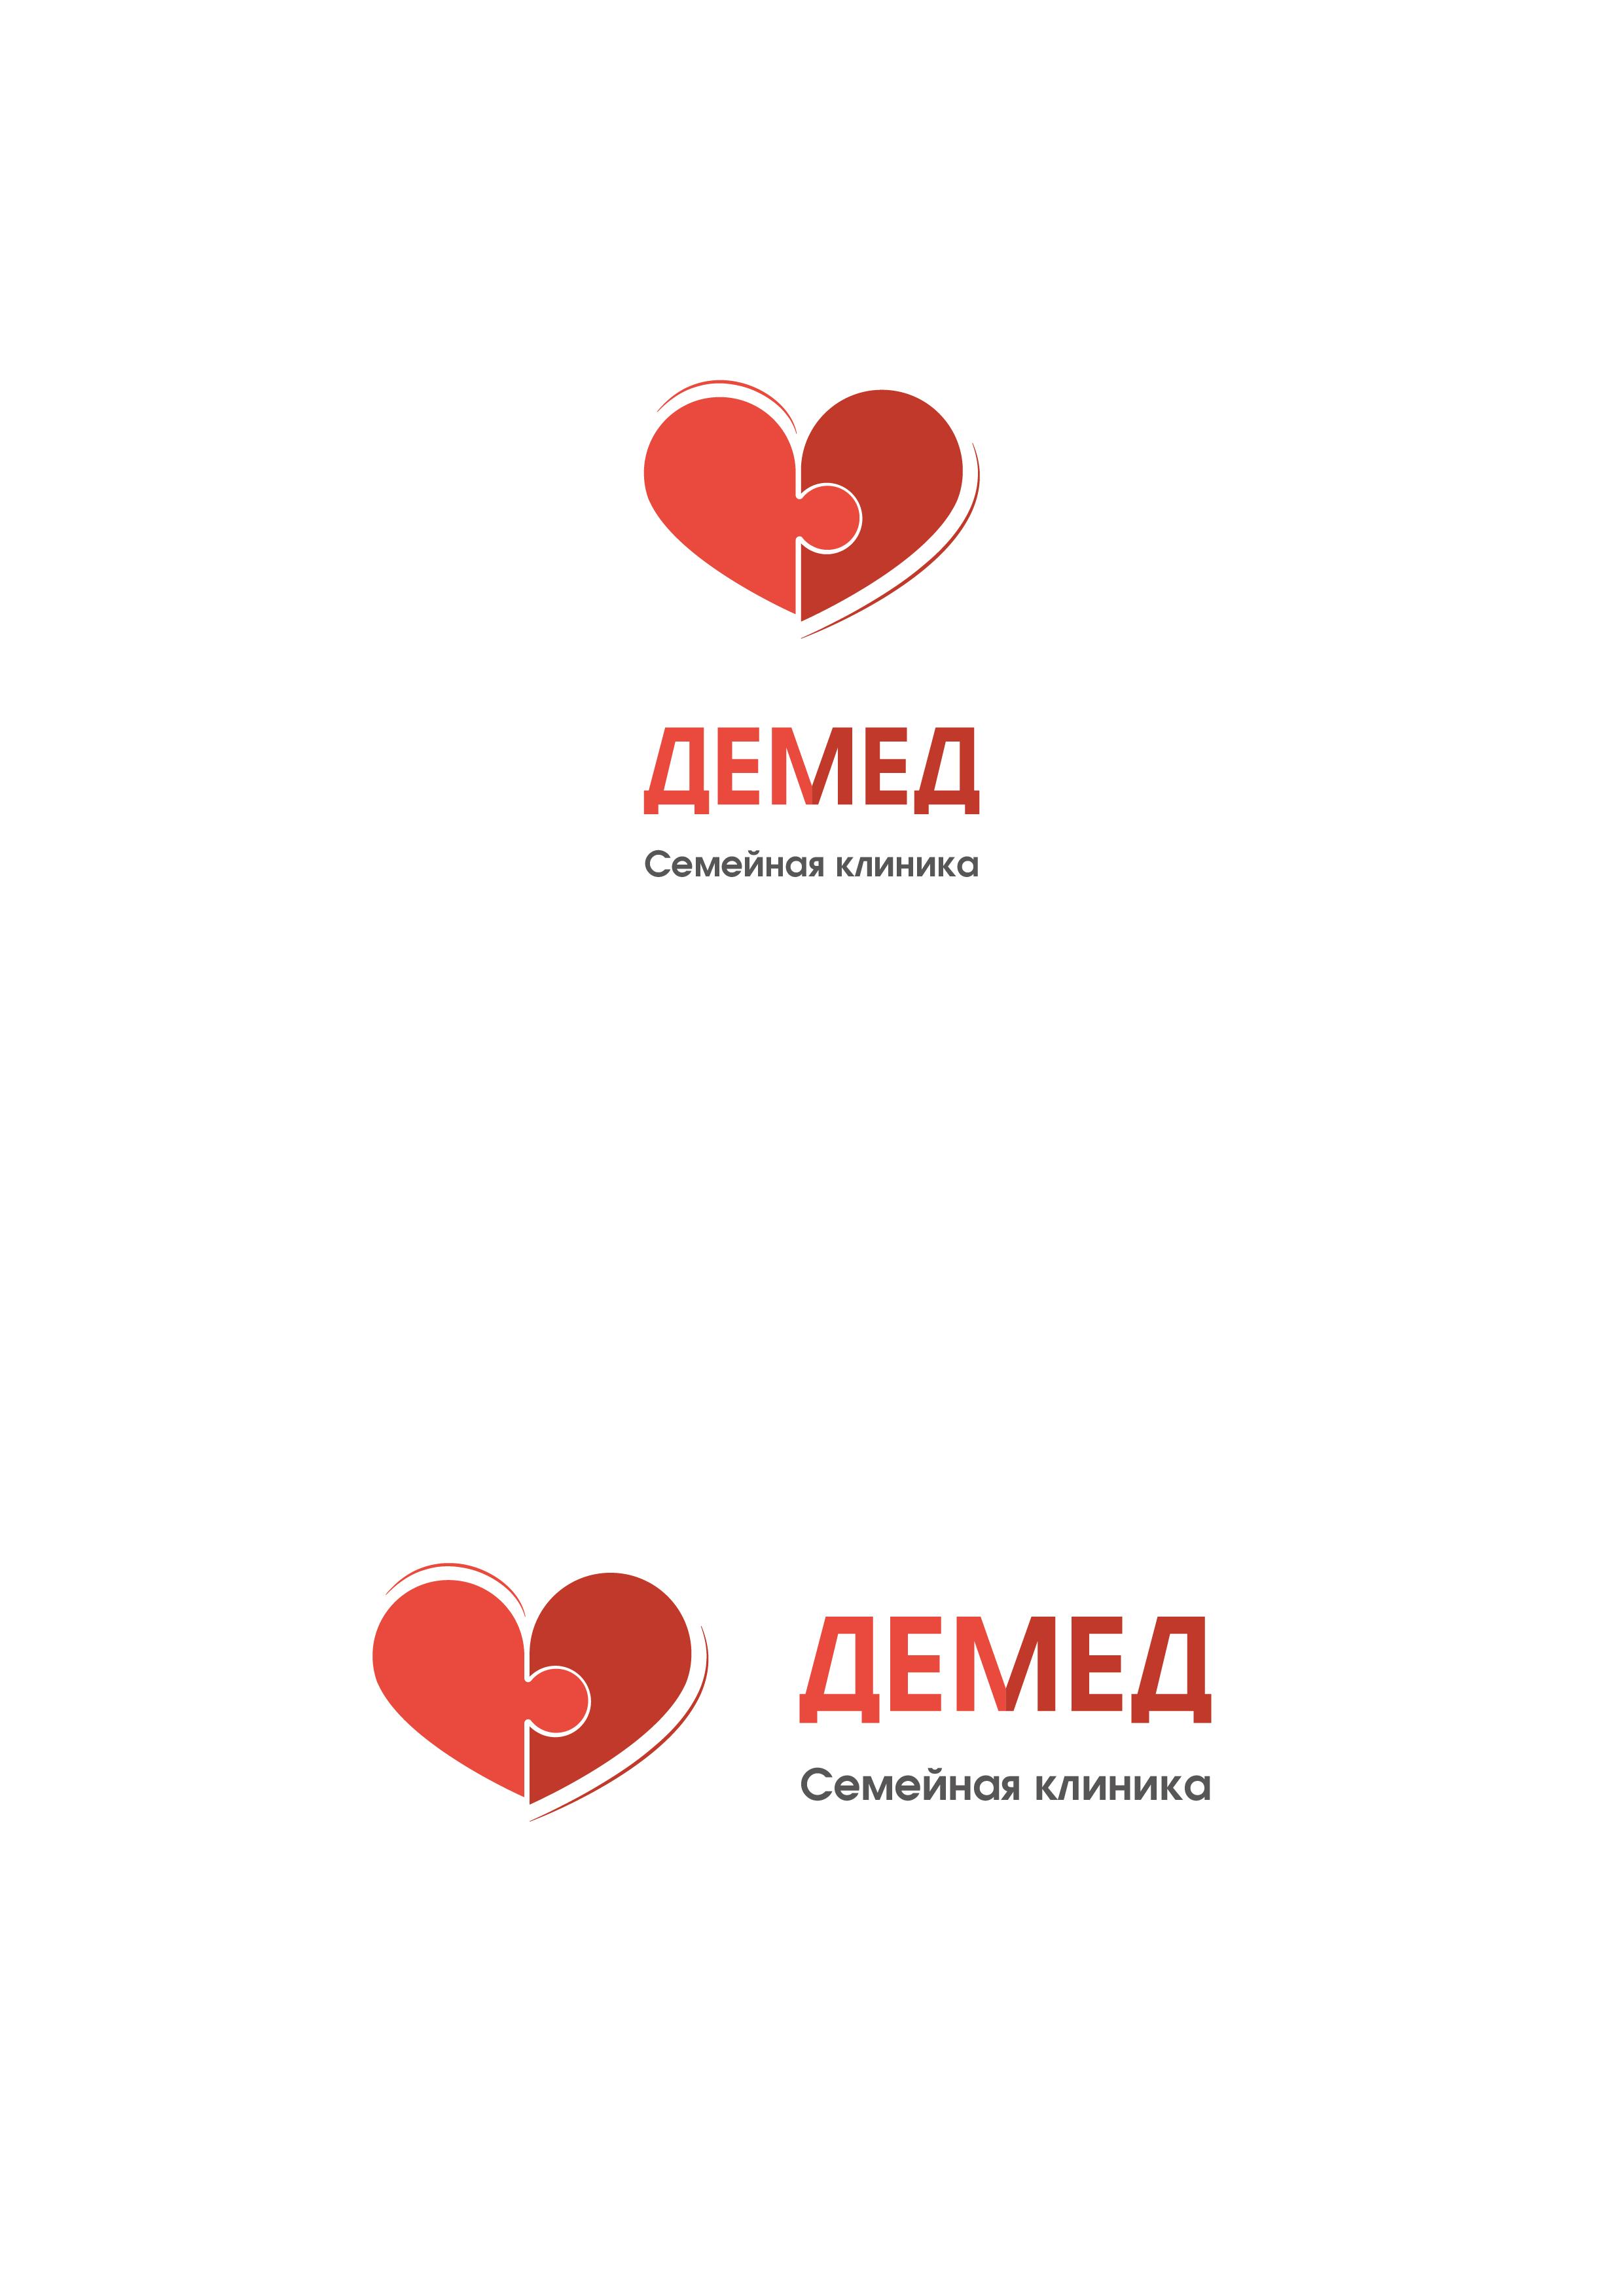 Логотип медицинского центра фото f_7125dca7c28691be.jpg